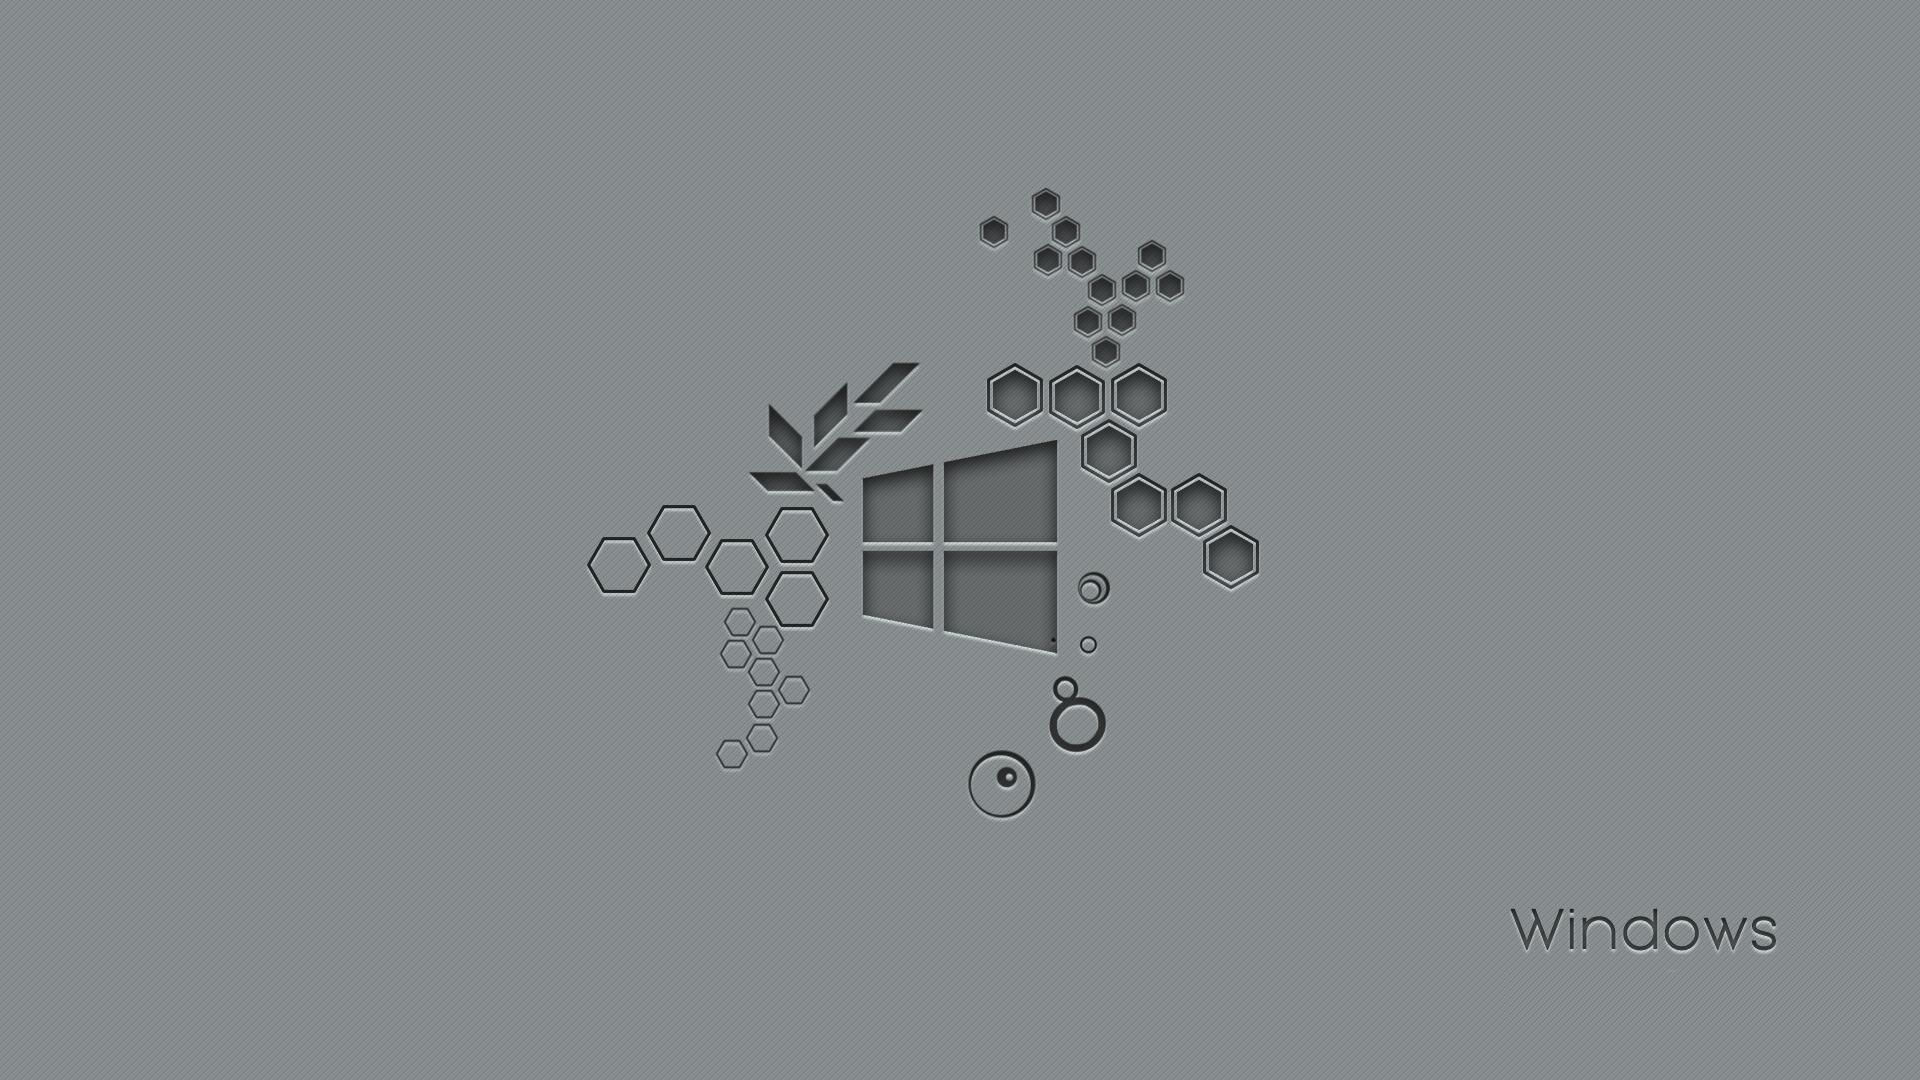 Download Windows 10 Hexagon 540x960 Resolution Full HD Wallpaper